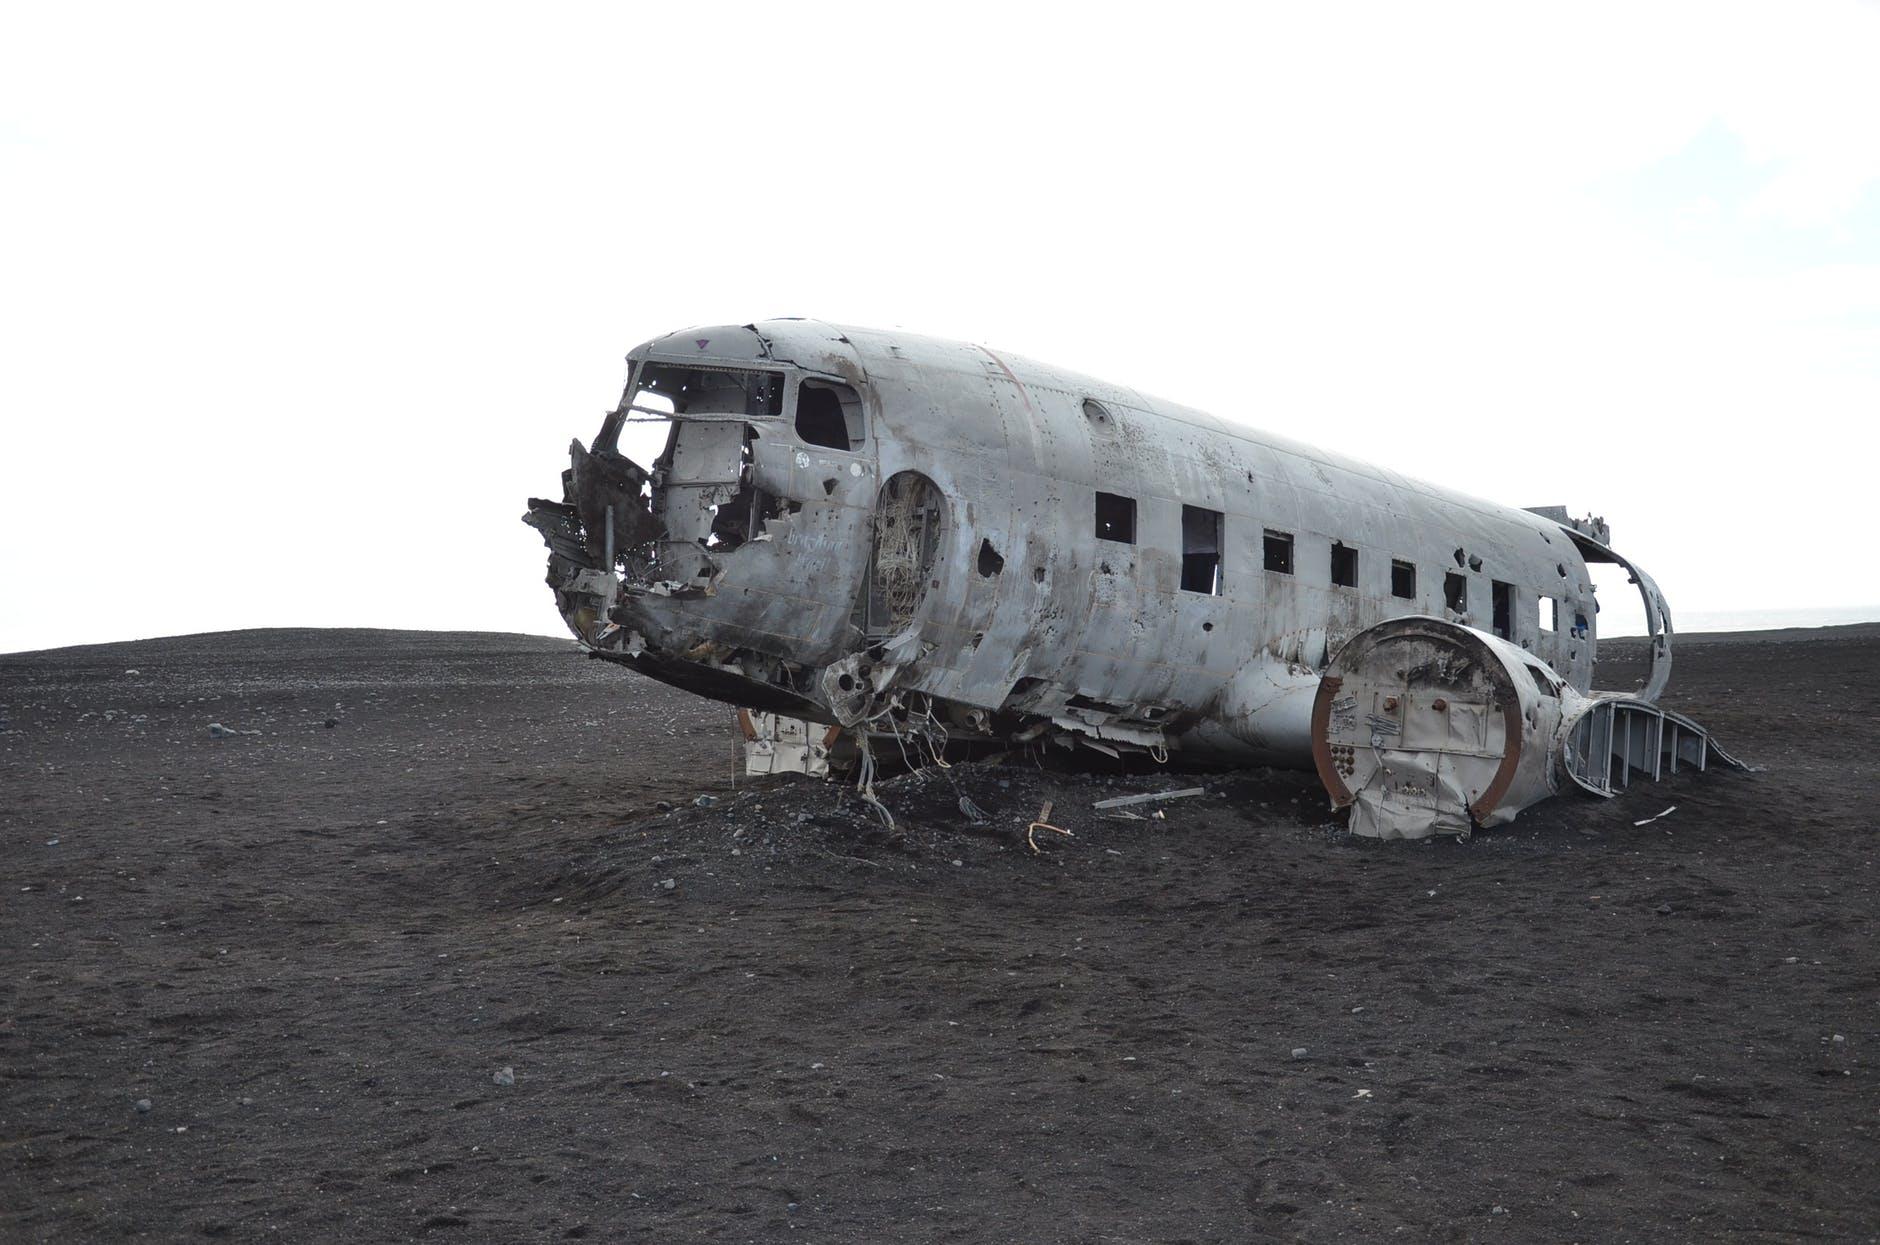 abandoned accident aeroplane aircraft